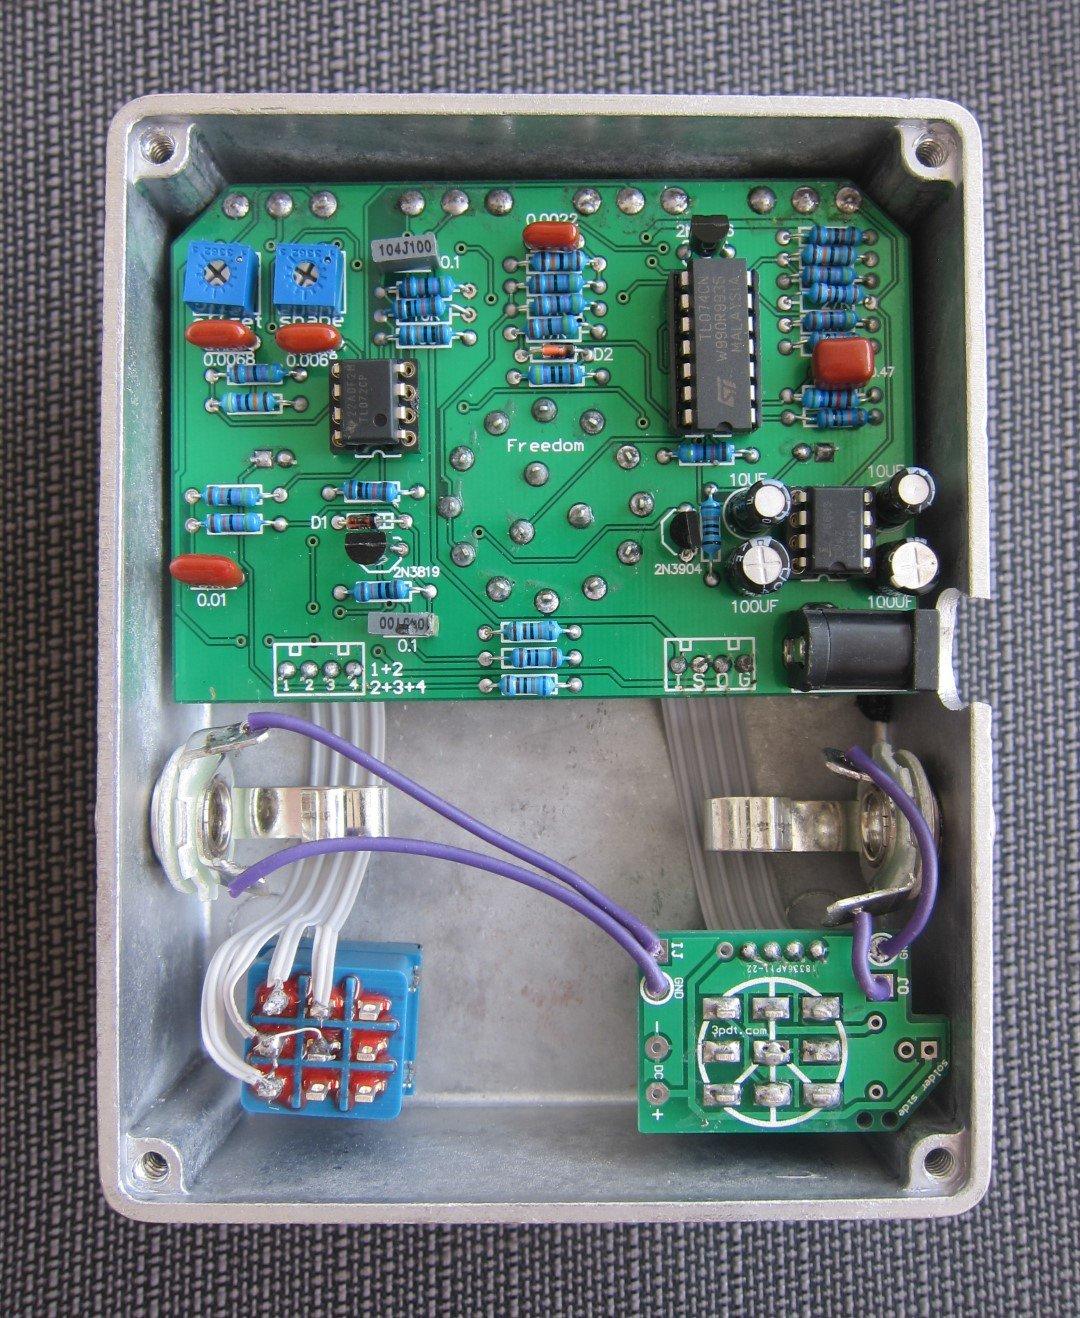 Fuzz Face Wiring 3pdt Explained Diagrams Jimi Hendrix Pedal Circuit Diagram Amazon Com Gristle Machine Tremolo Auto Wah Synth Guitar